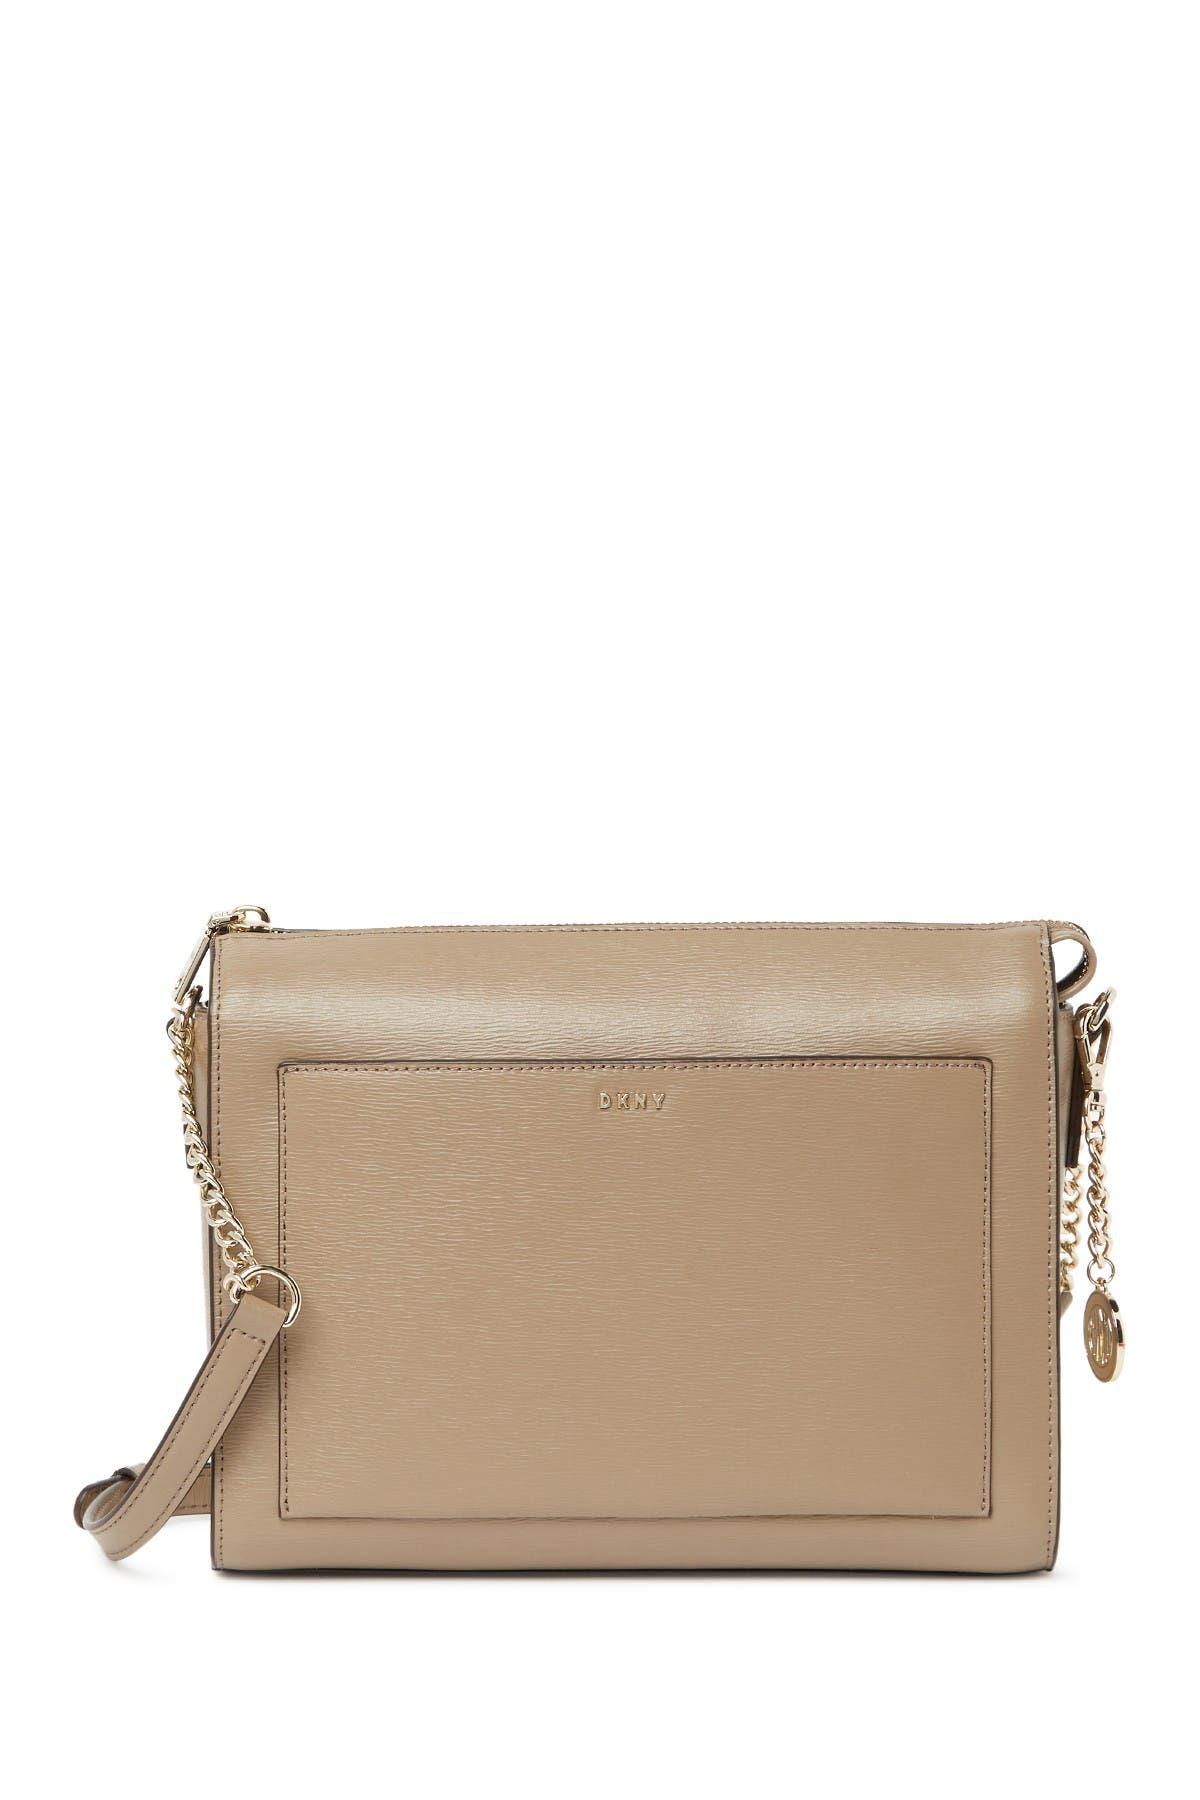 Image of DKNY Bryant Leather Medium Box Crossbody Bag